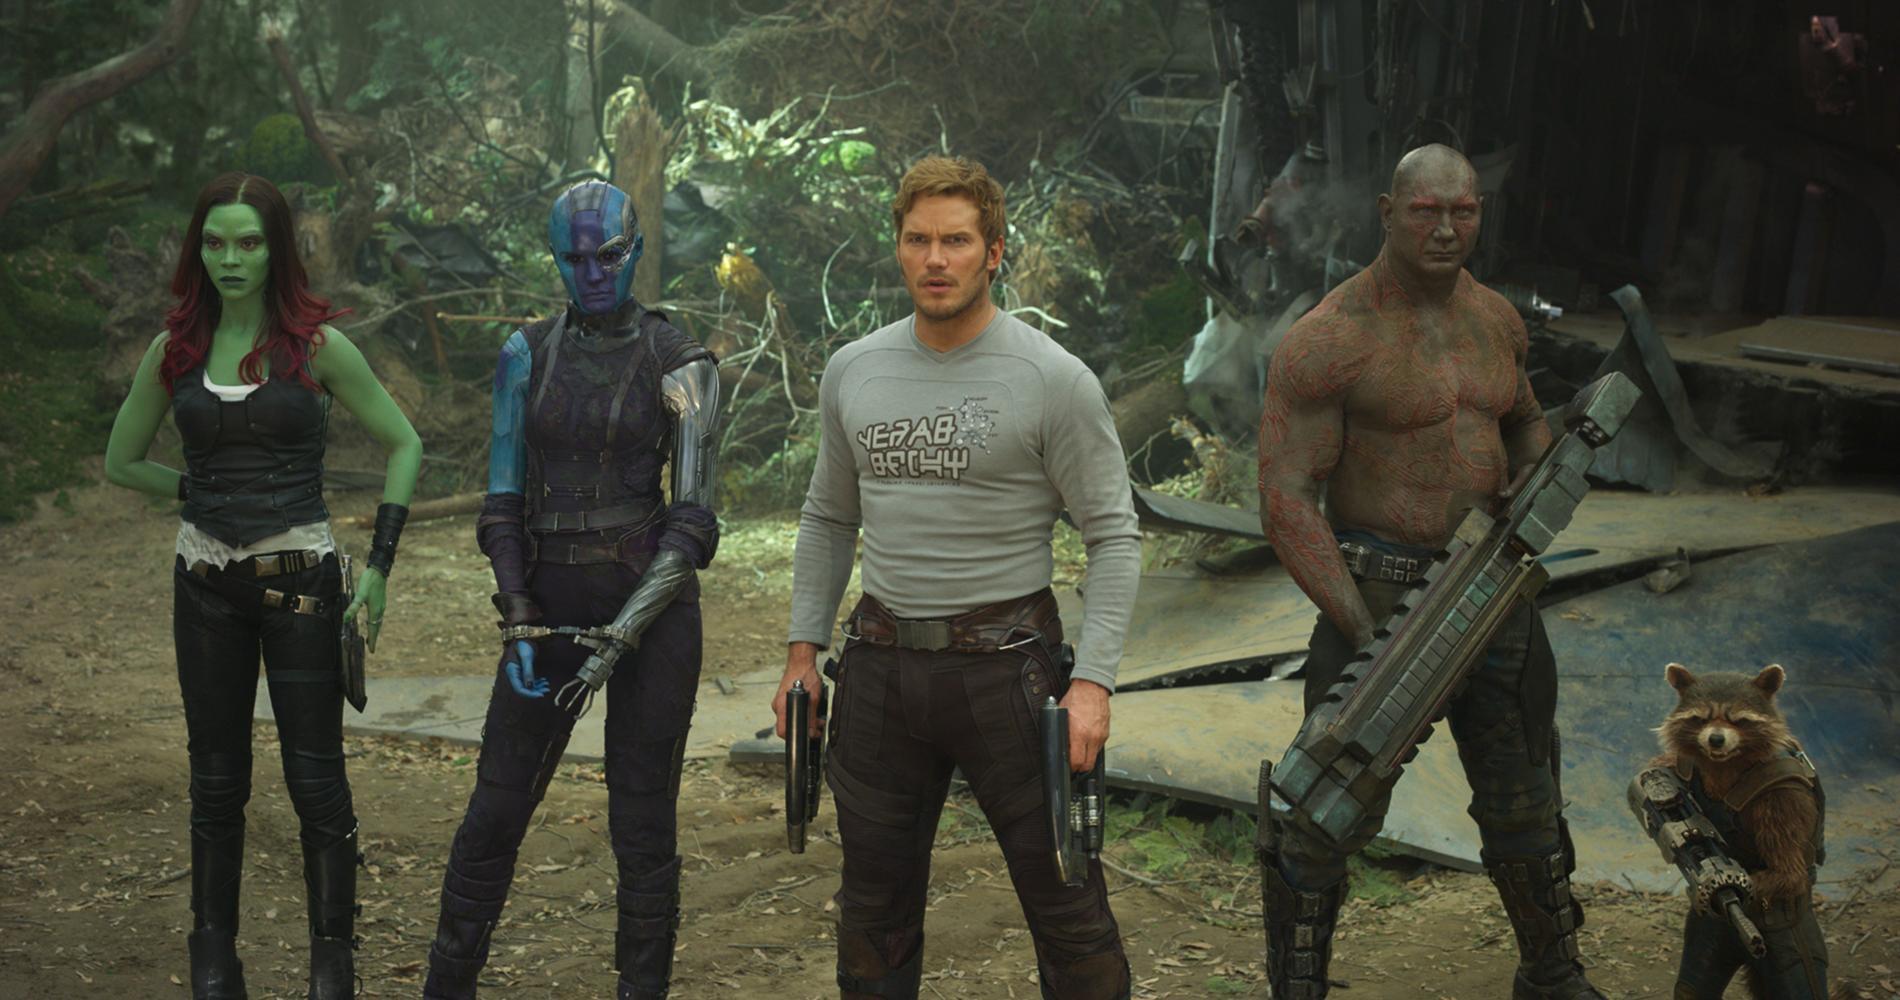 """Guardians Of The Galaxy Vol. 2"" med Gamora (Zoe Saldana), Nebula (Karen Gillan), Star-Lord/Peter Quill (Chris Pratt), Drax (Dave Bautista) och Rocket (Bradley Cooper)."